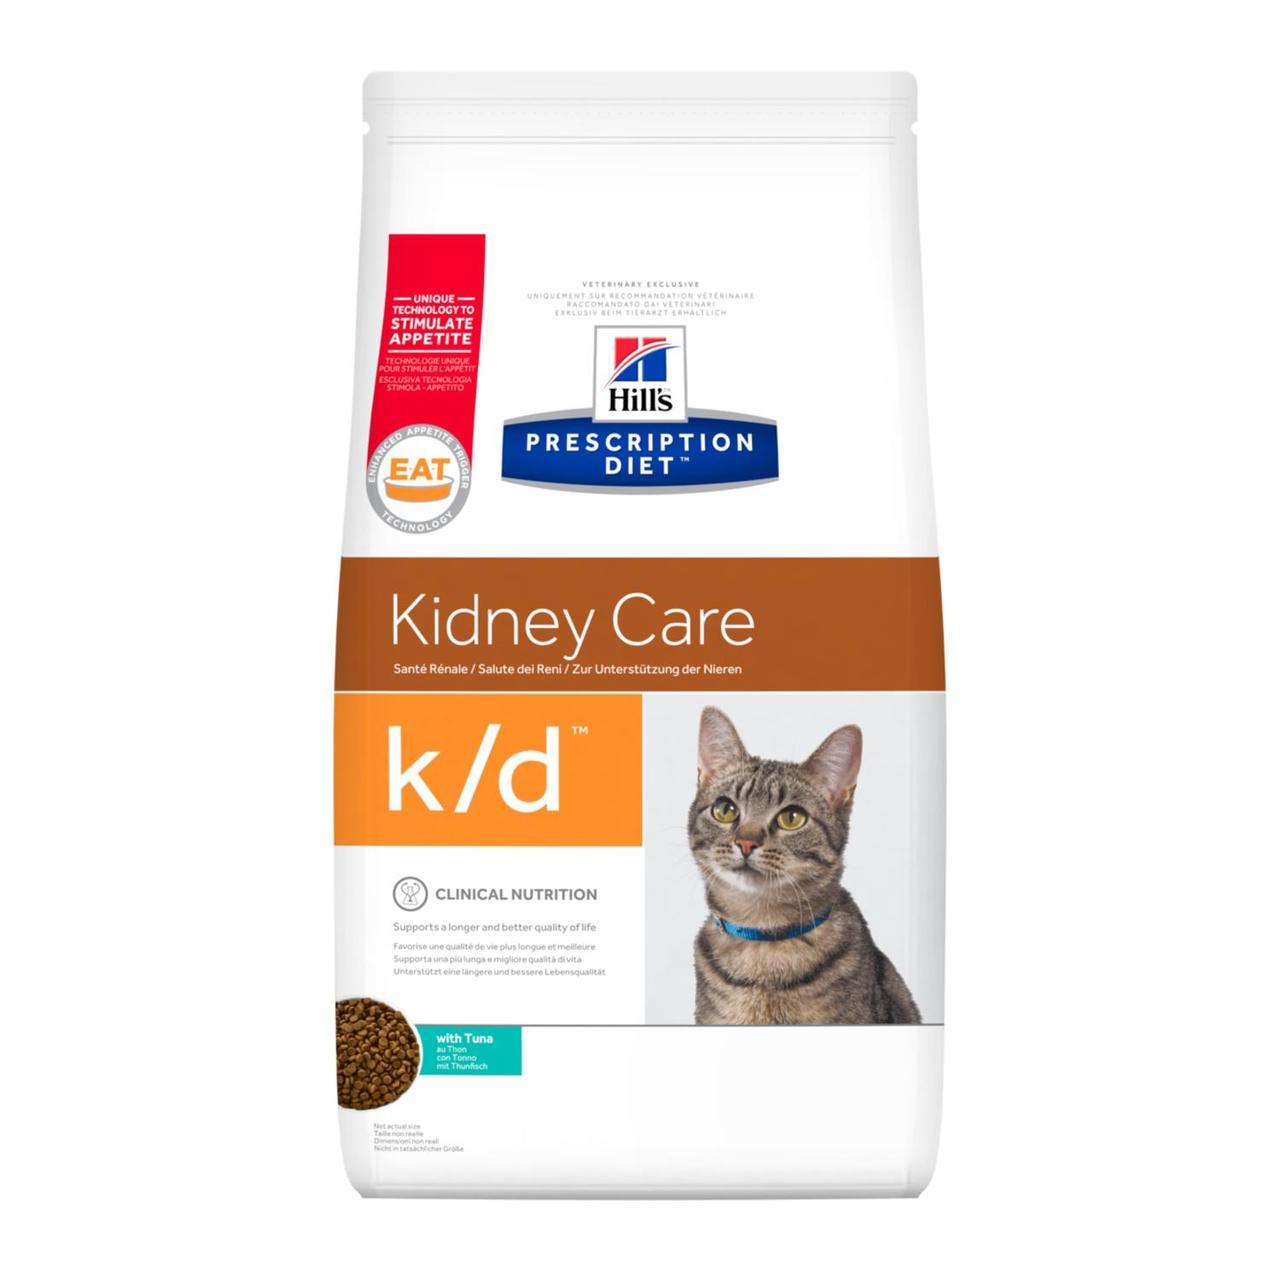 Hill's Prescription Diet k/d Kidney Care при почечной недостаточности, тунец, уп.1,5 кг